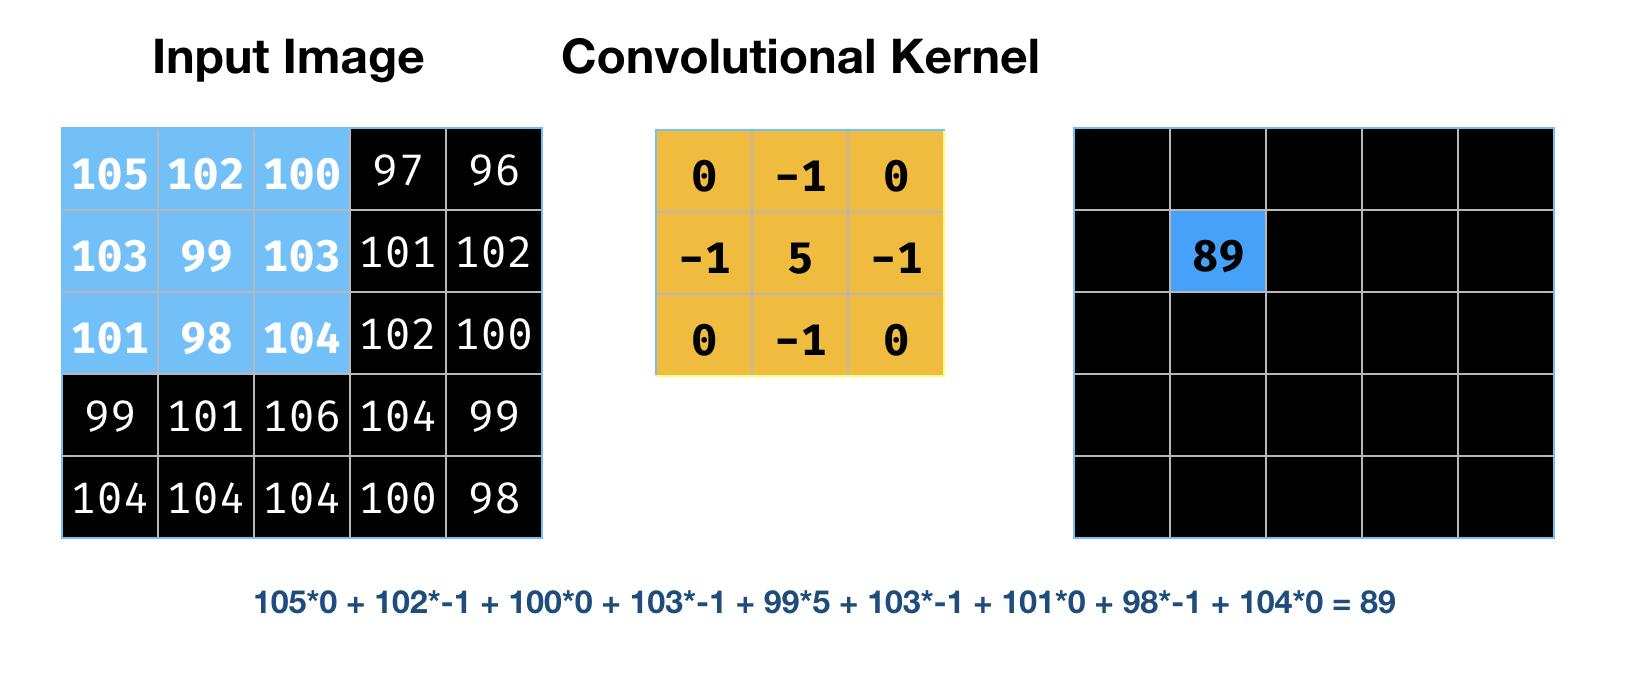 convolutional layer